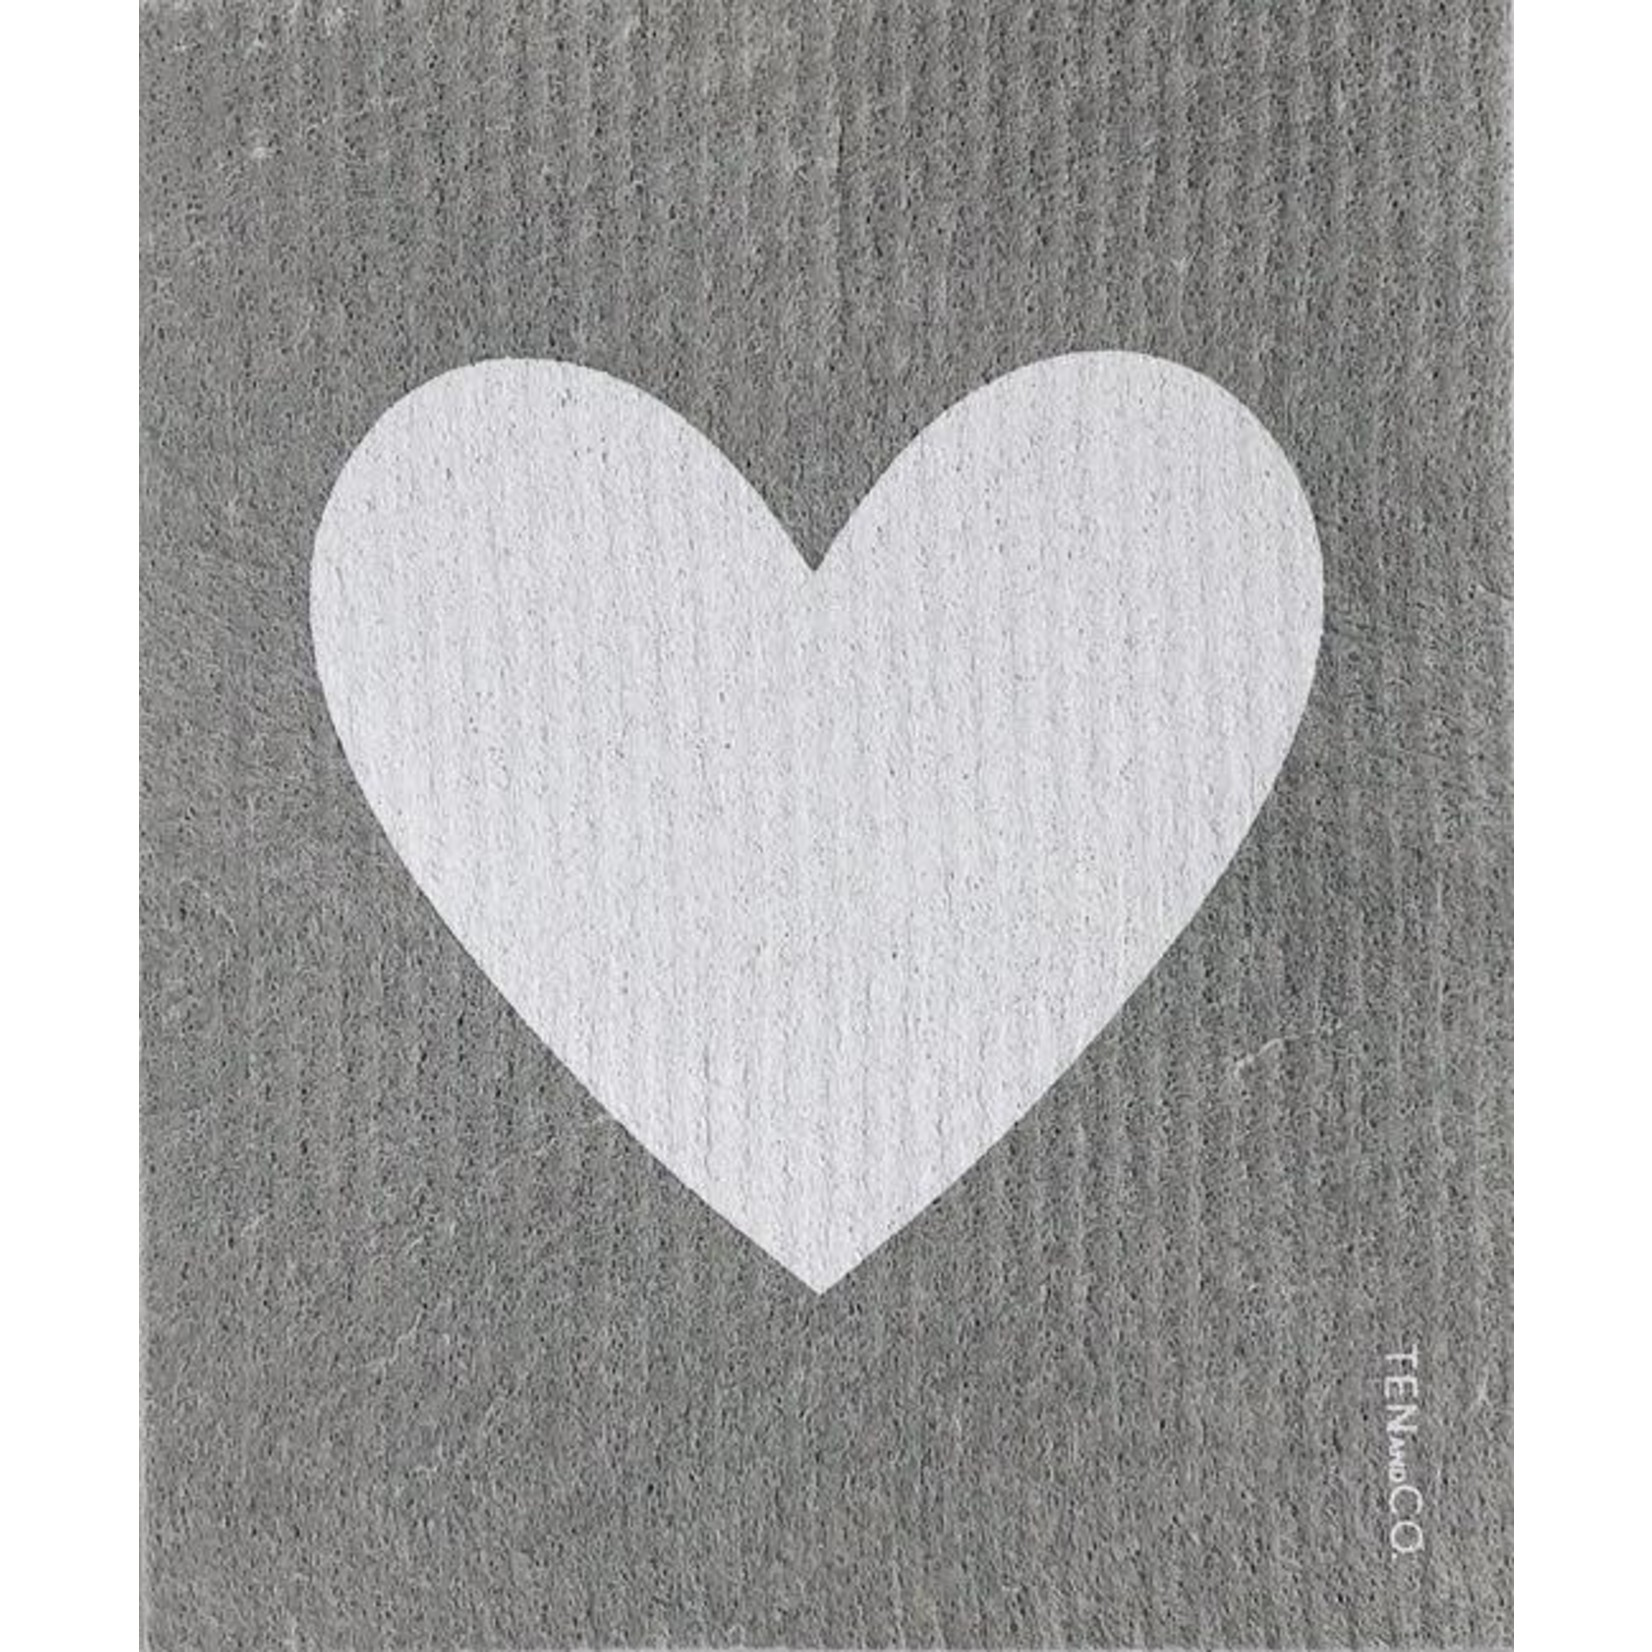 TEN AND CO. SPONGE CLOTH - BIG LOVE GREY